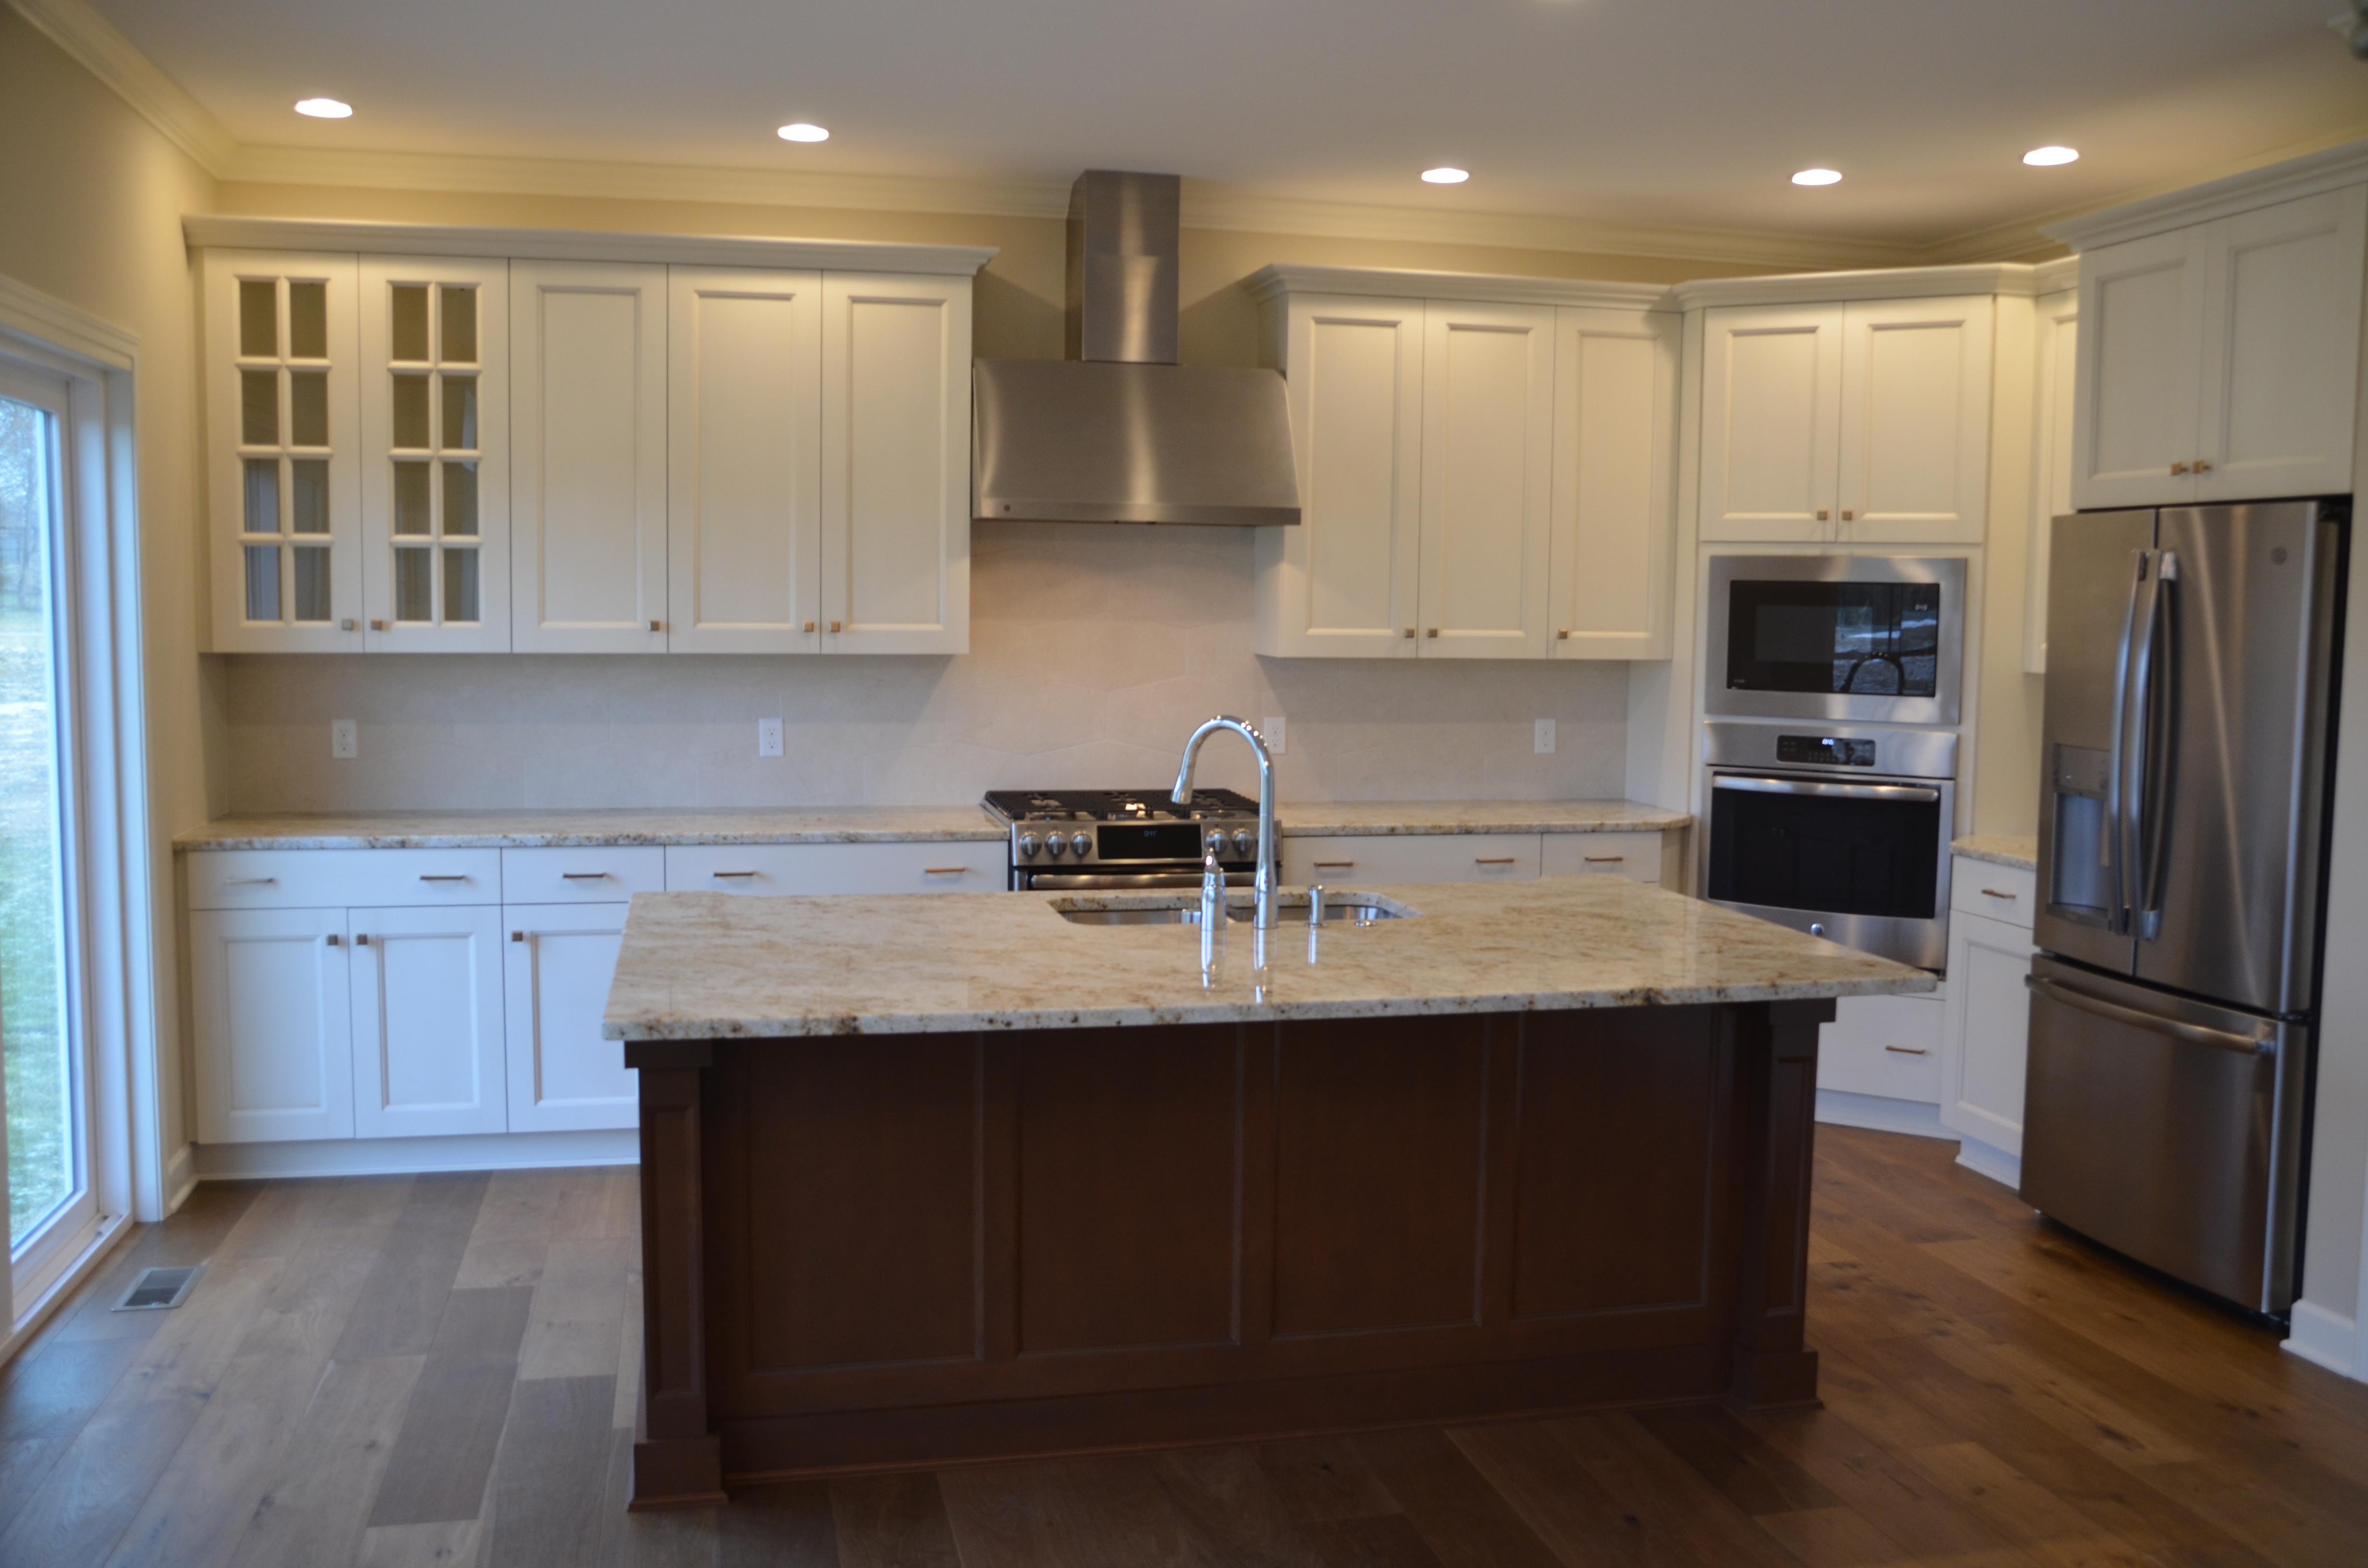 Rockdale Meadows (Lot 9) Light-filled kitchen